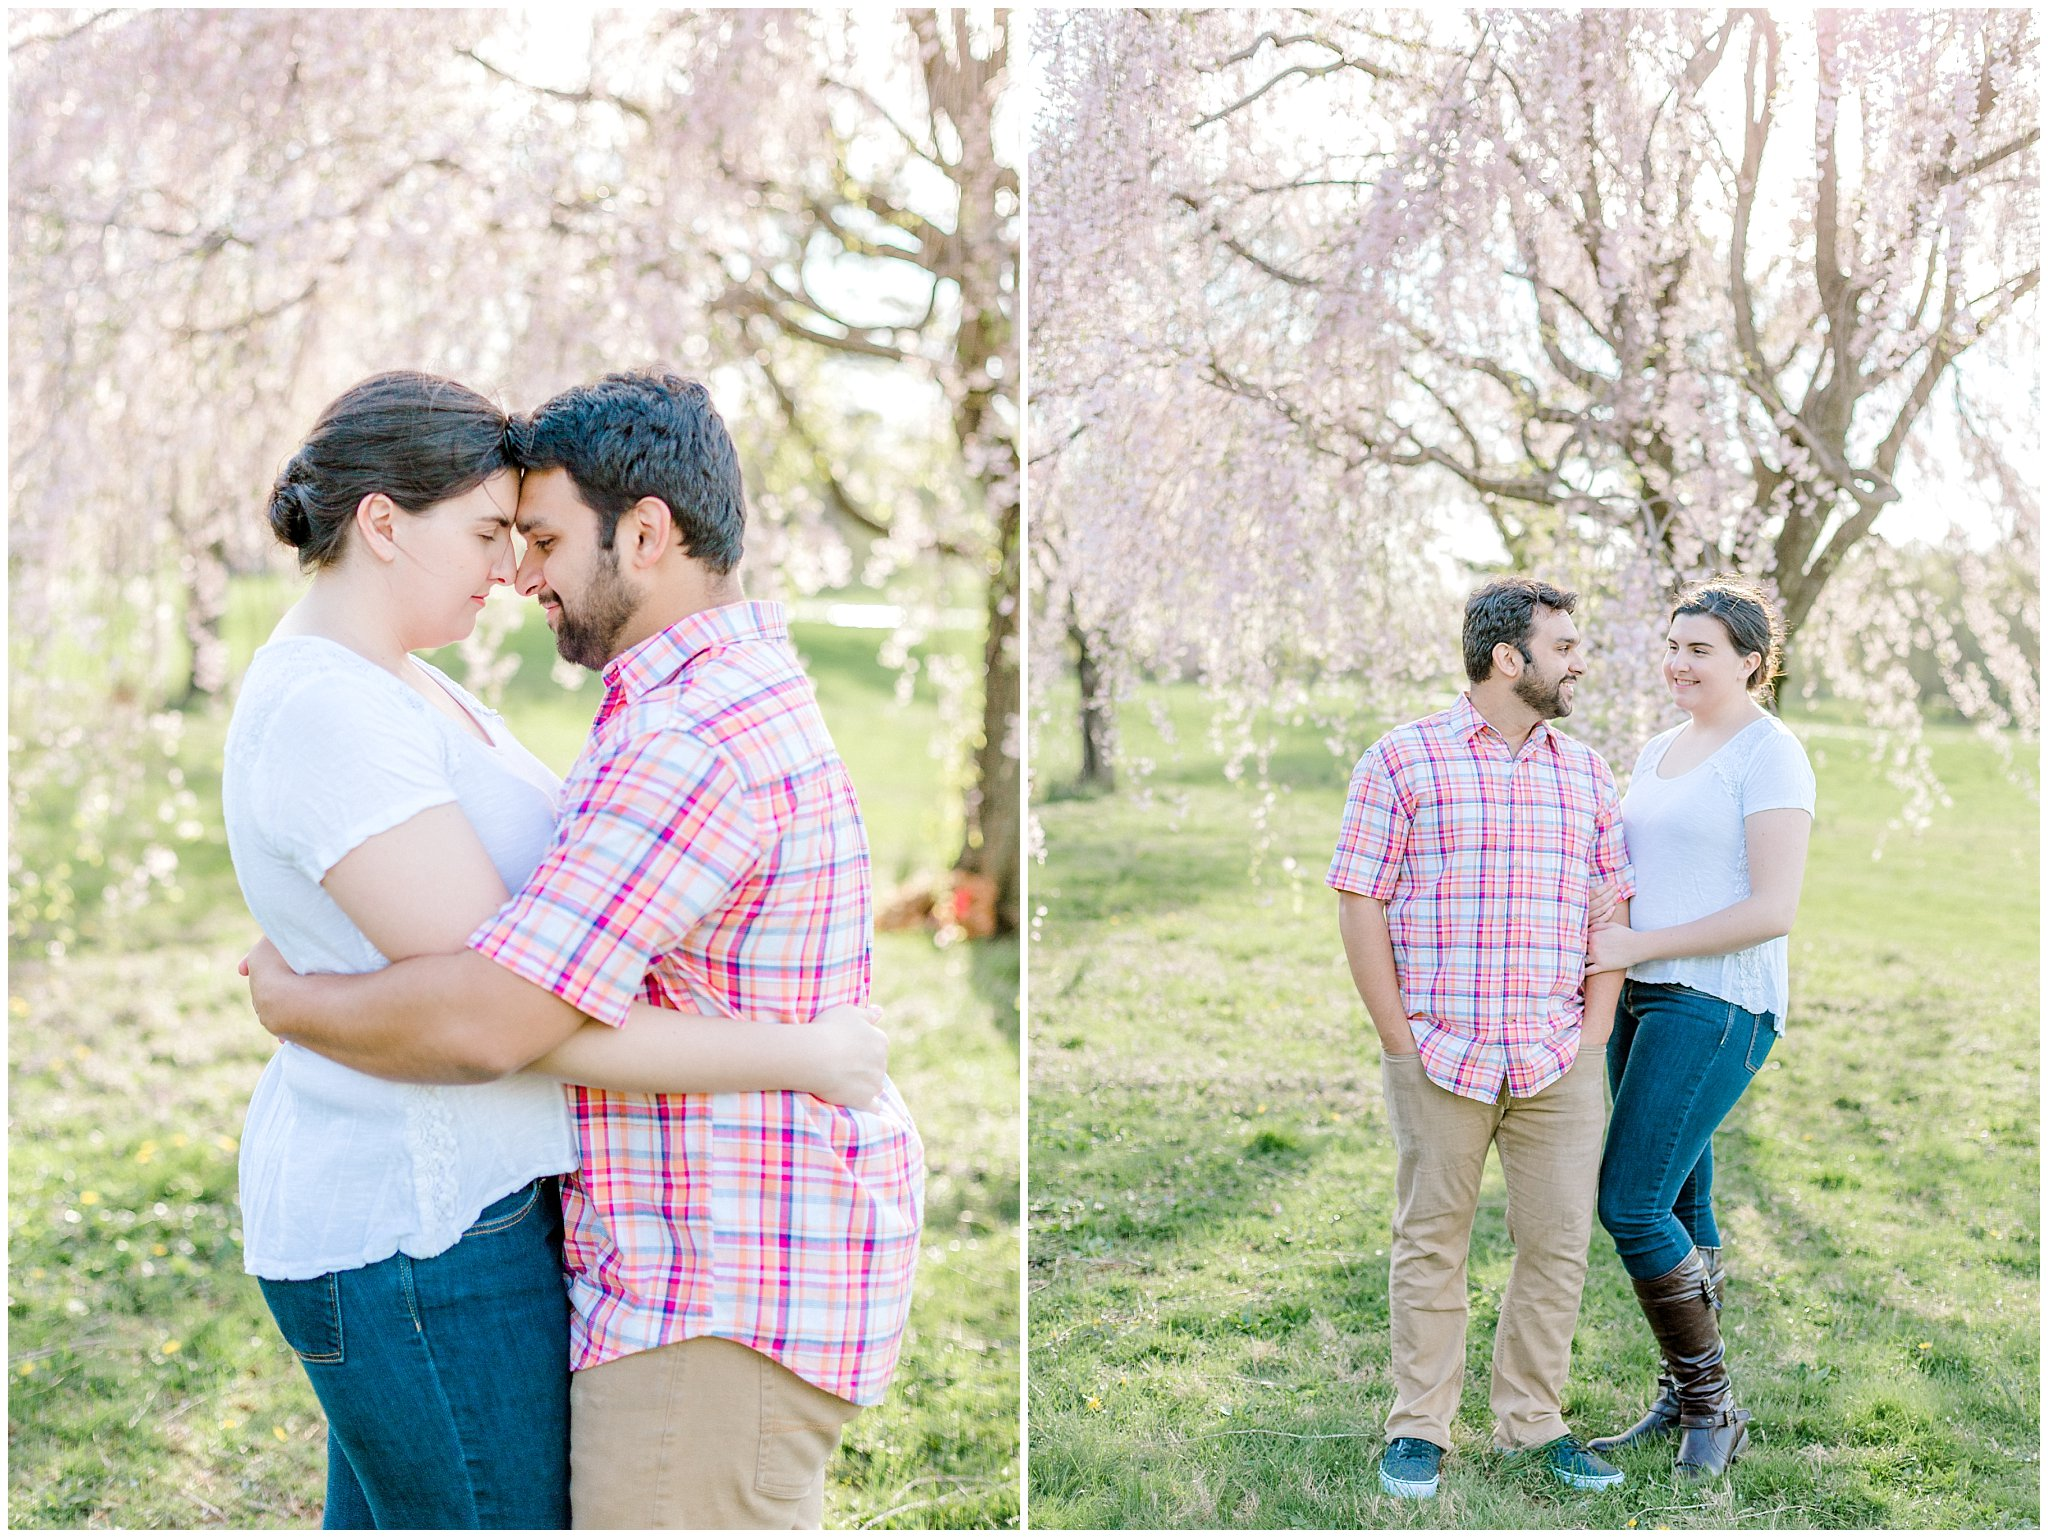 Lehigh Valley Spring Cherry Blossom Engagement Session Pennsylvania Wedding Photographer (16).jpg